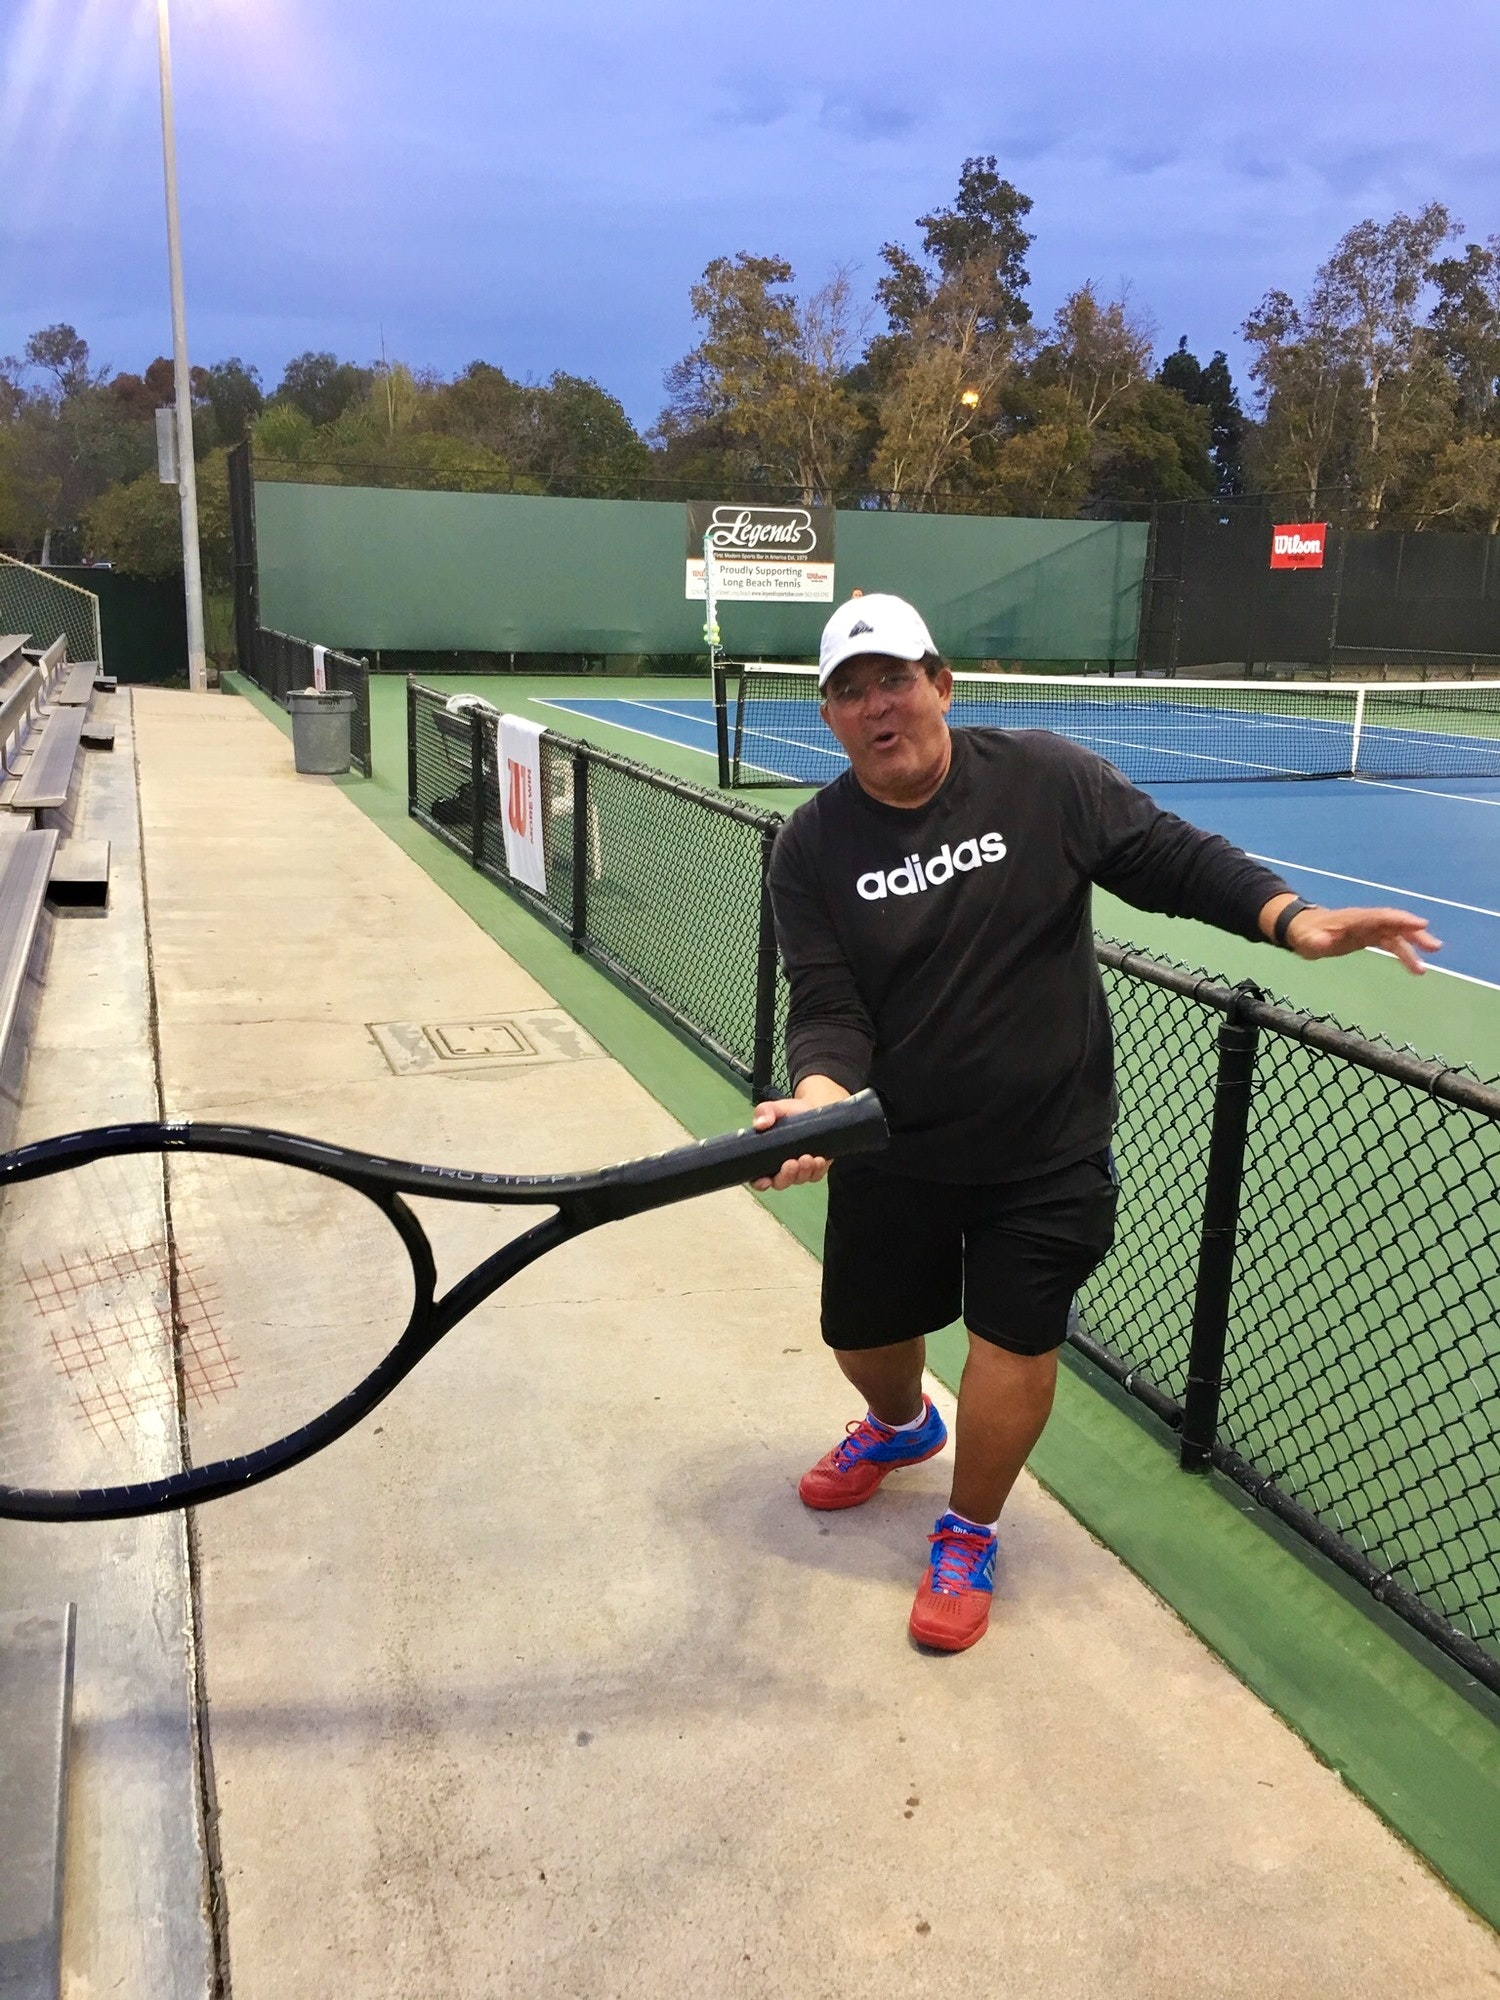 Joe S. teaches tennis lessons in Downey, CA